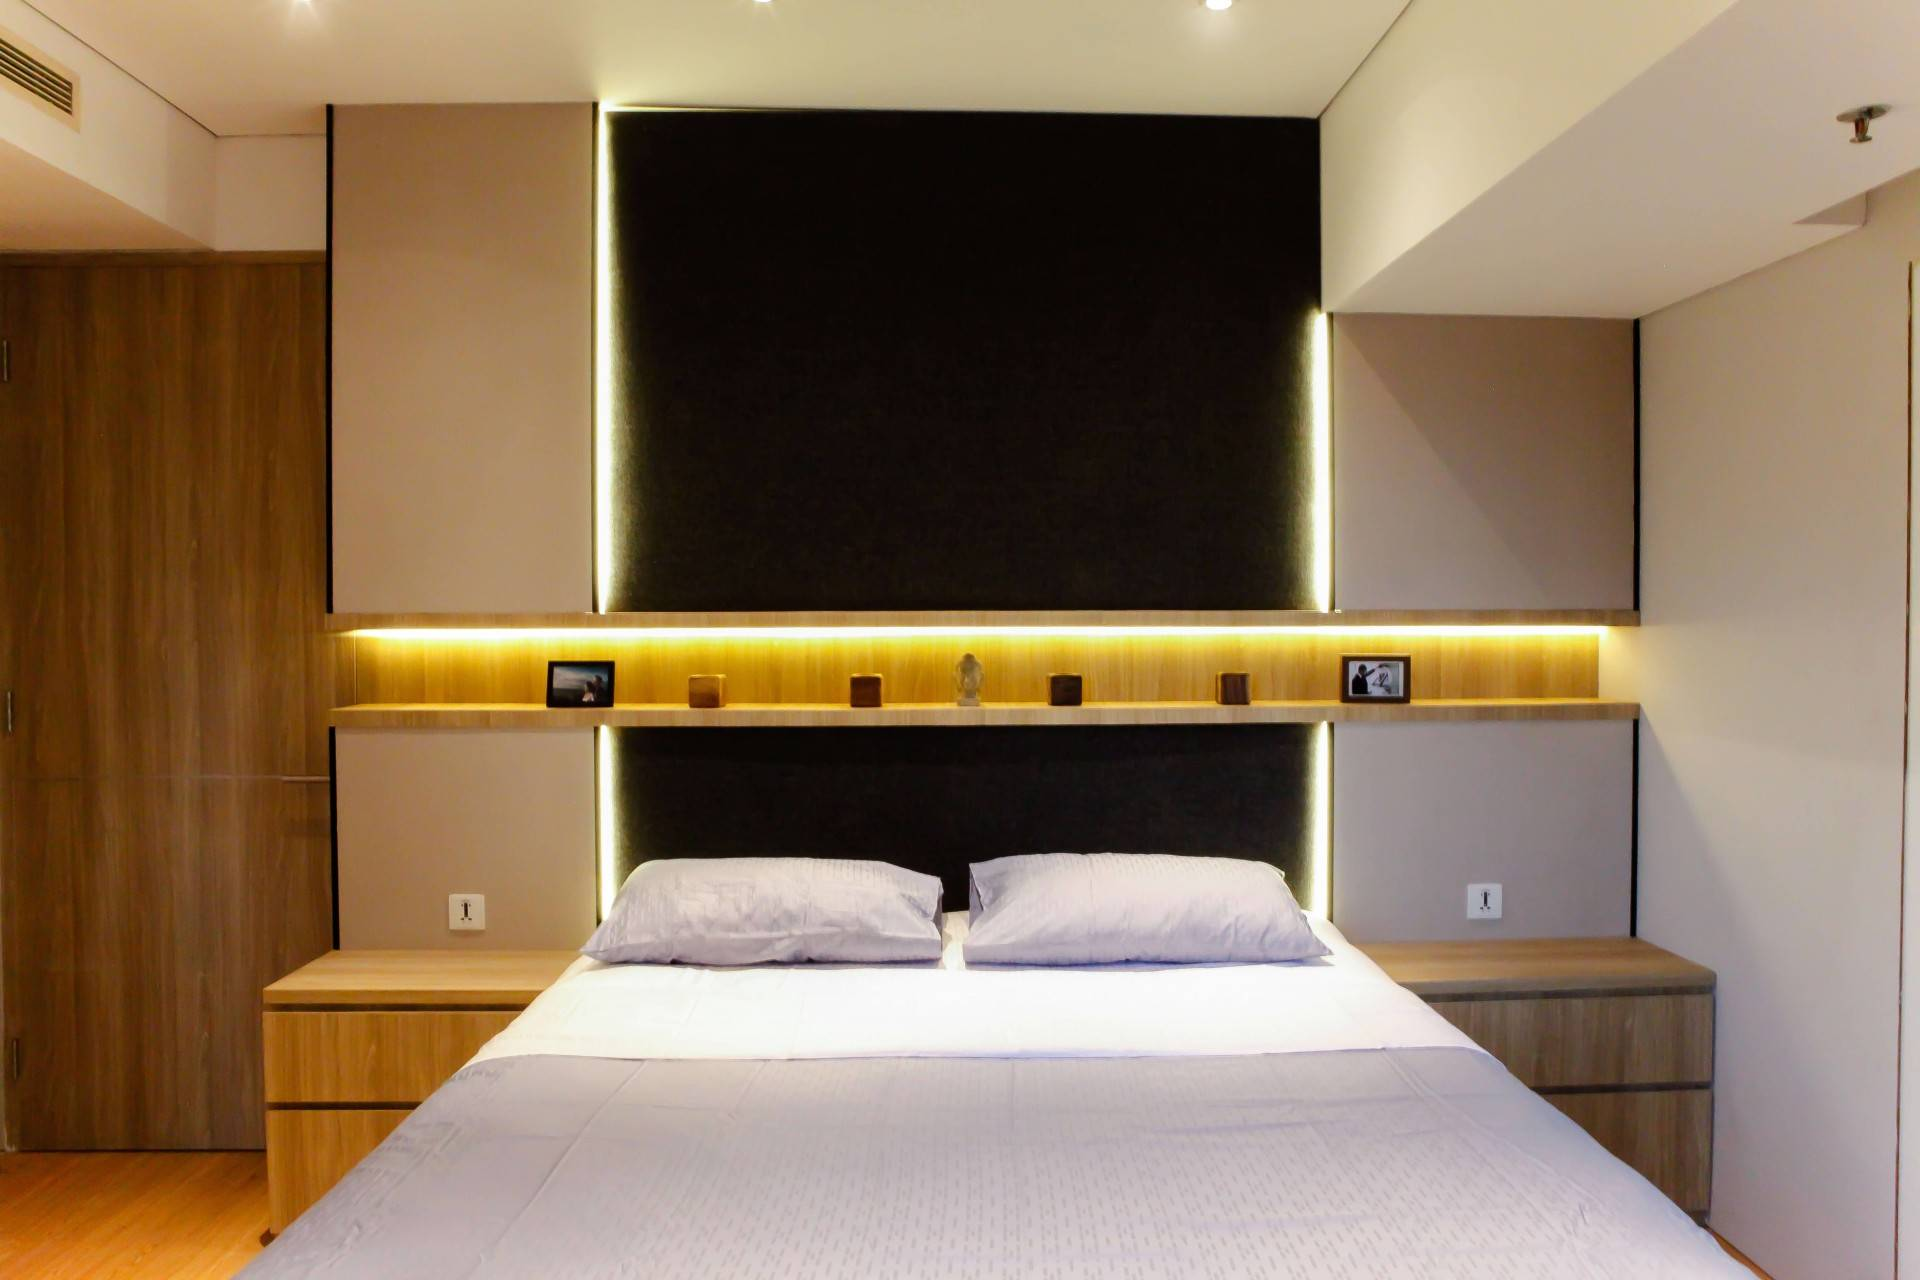 Design Intervention Pavilion Apartment At Kh Mas Mansyur Jakarta Jakarta Bedroom Minimalis,modern,industrial,glass  2590